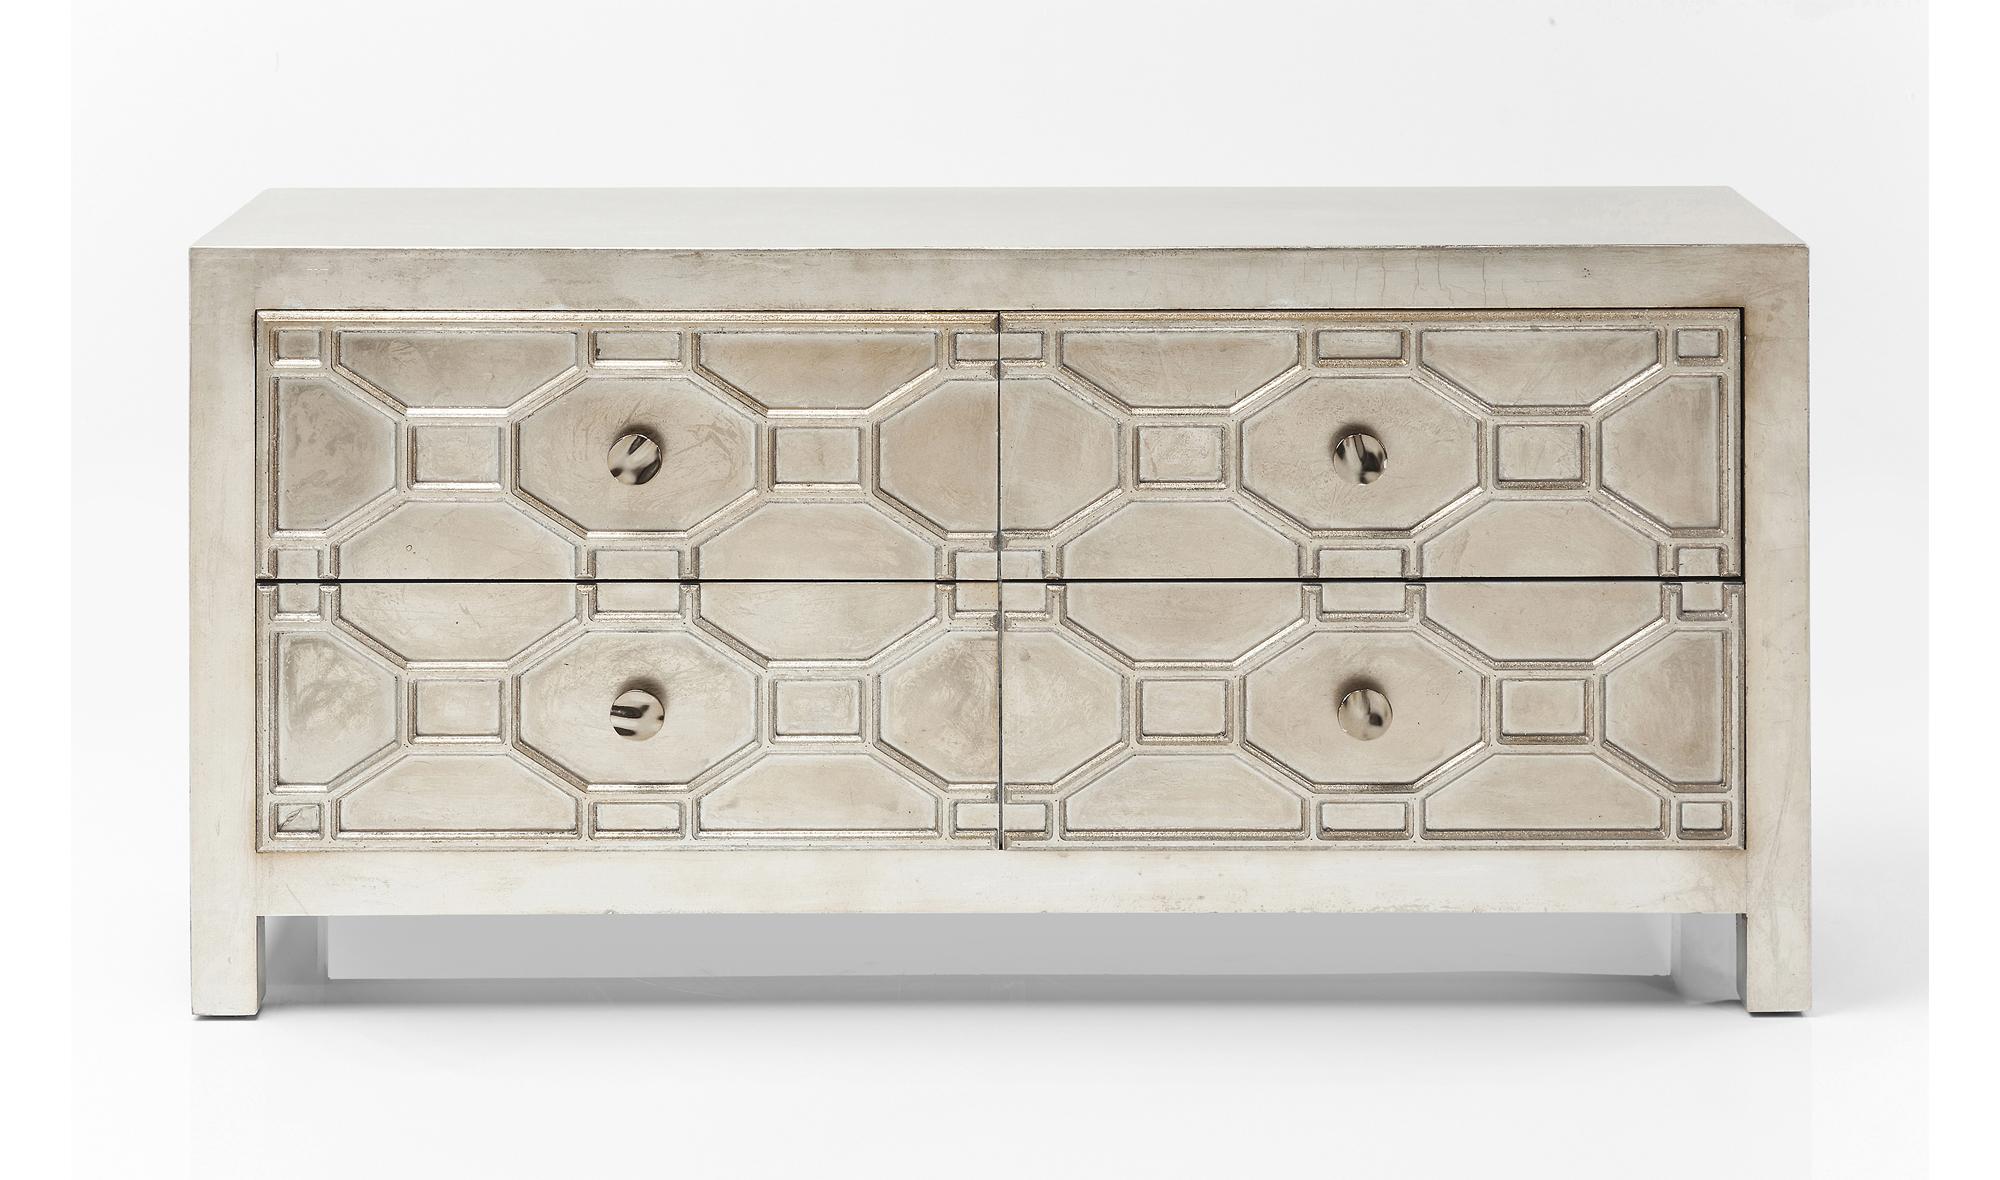 Aparador tnico alhambra 4 cajones en for Muebles maison du monde segunda mano